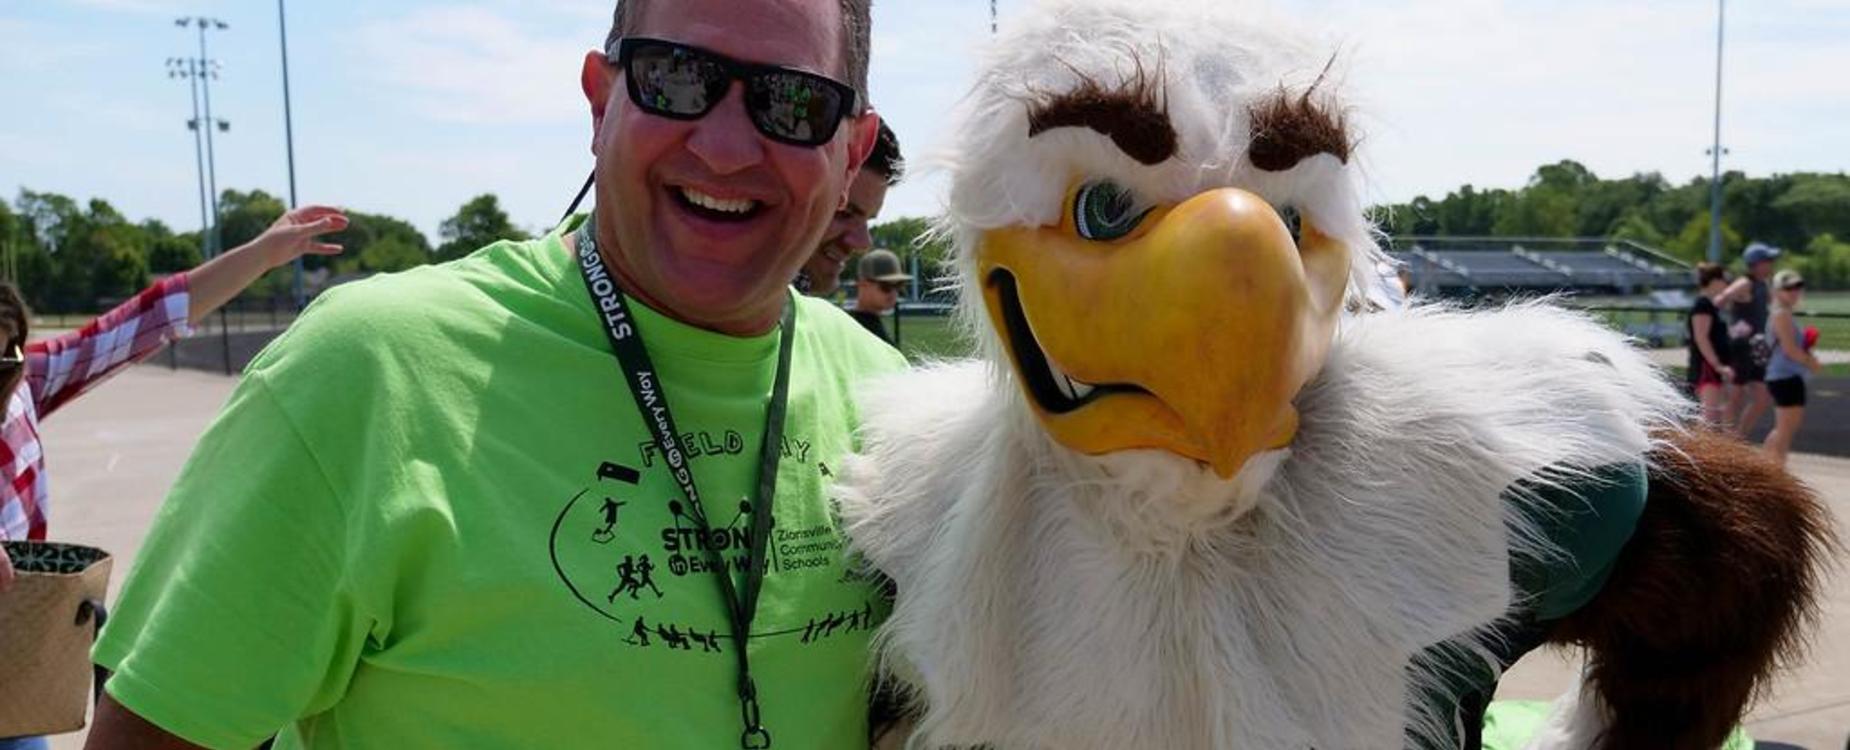 Scott and Eagle Mascot